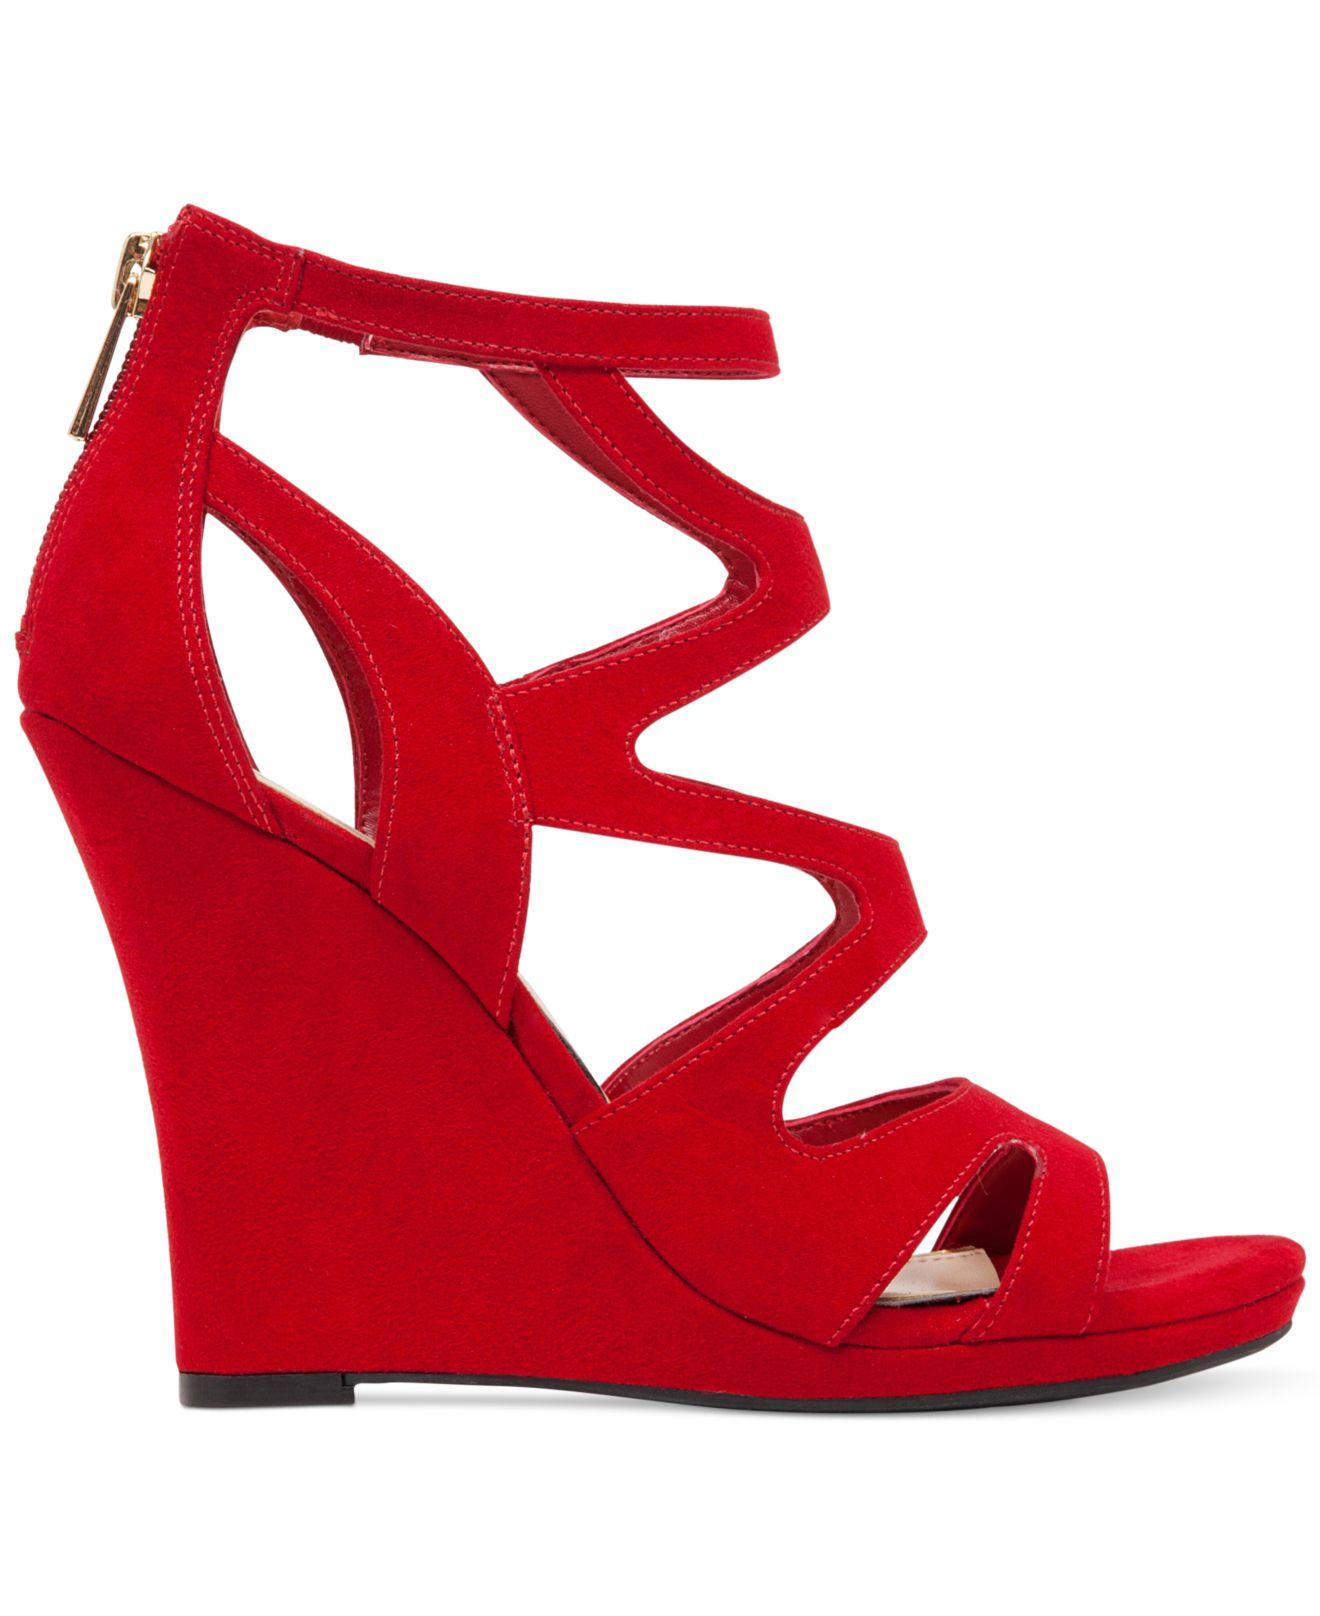 Bandolino Red Wedge Shoes